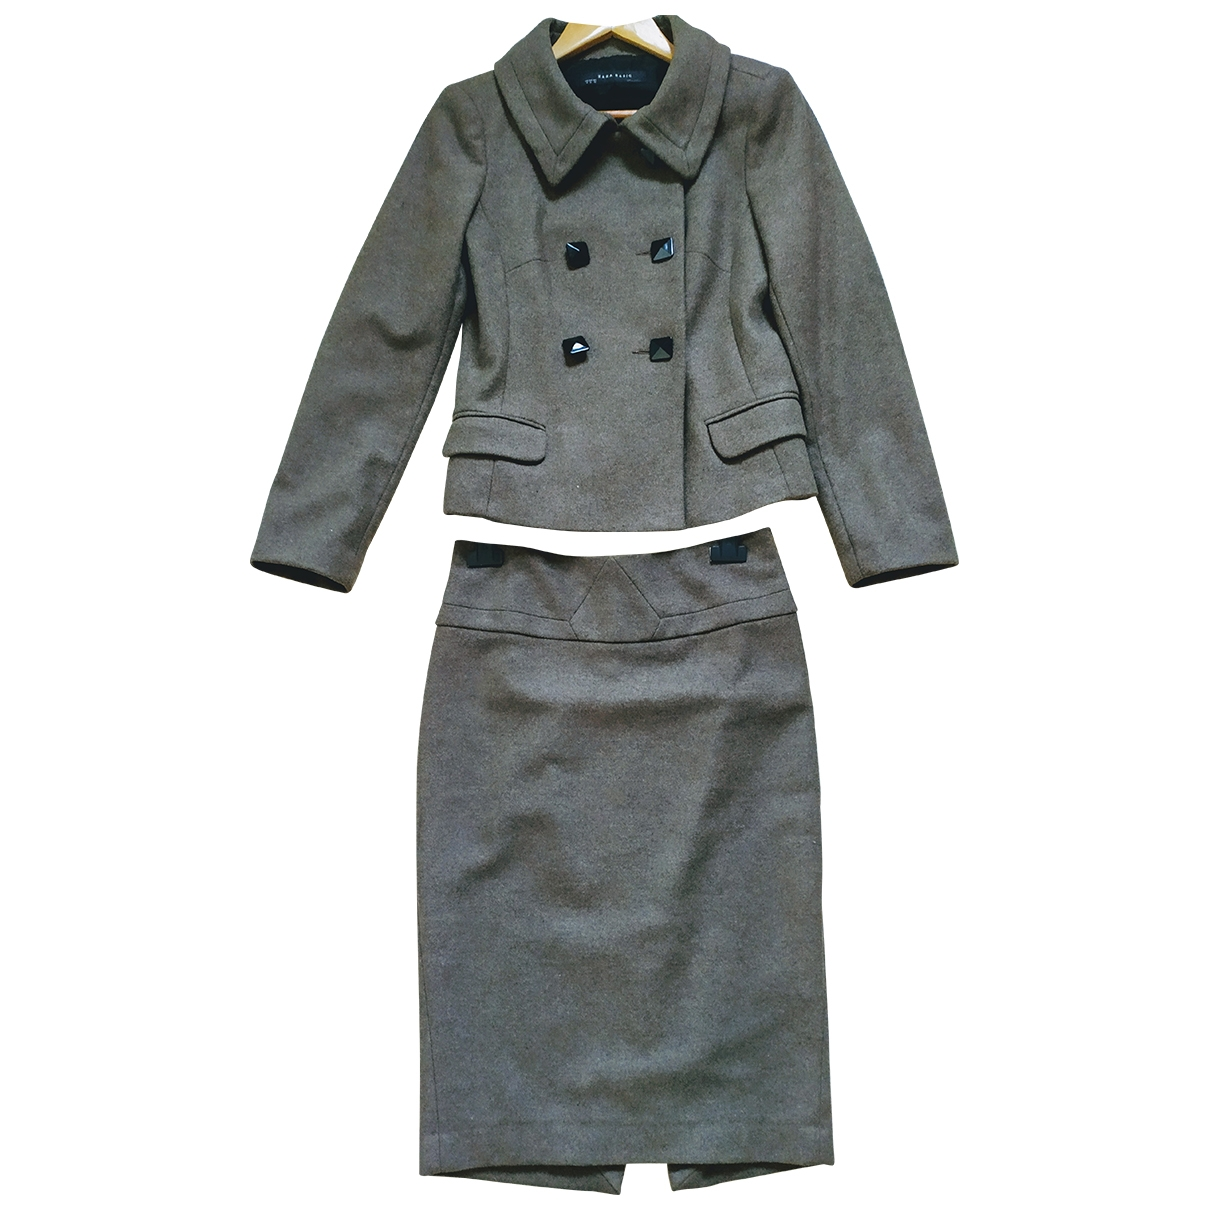 Zara \N Brown Wool dress for Women S International